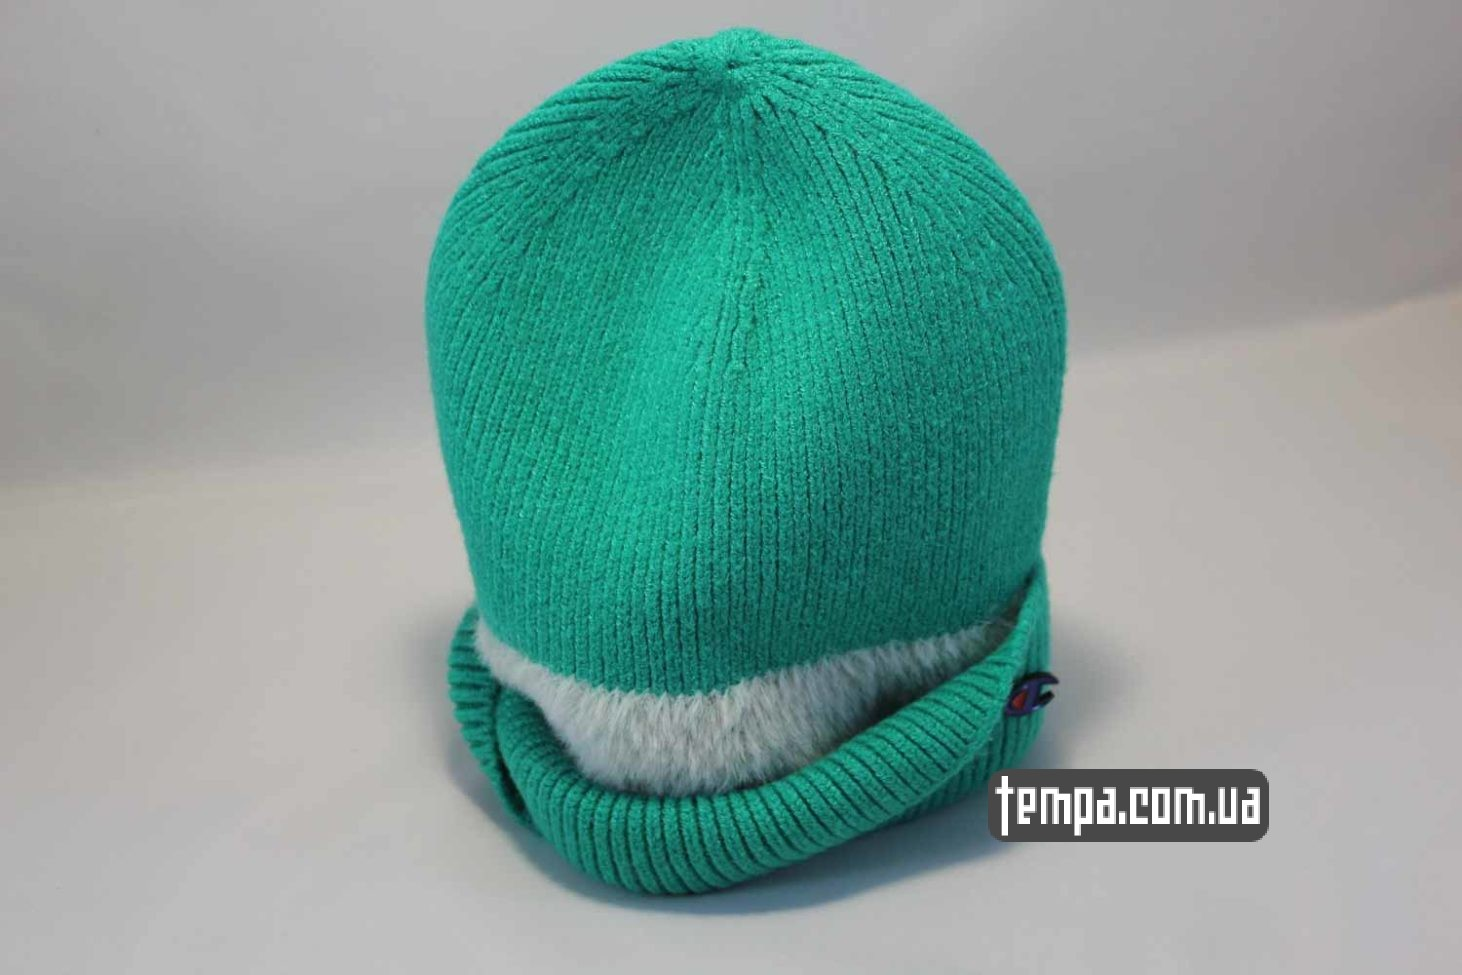 шерстяная шапка beanie Champion green зеленая купить Украина